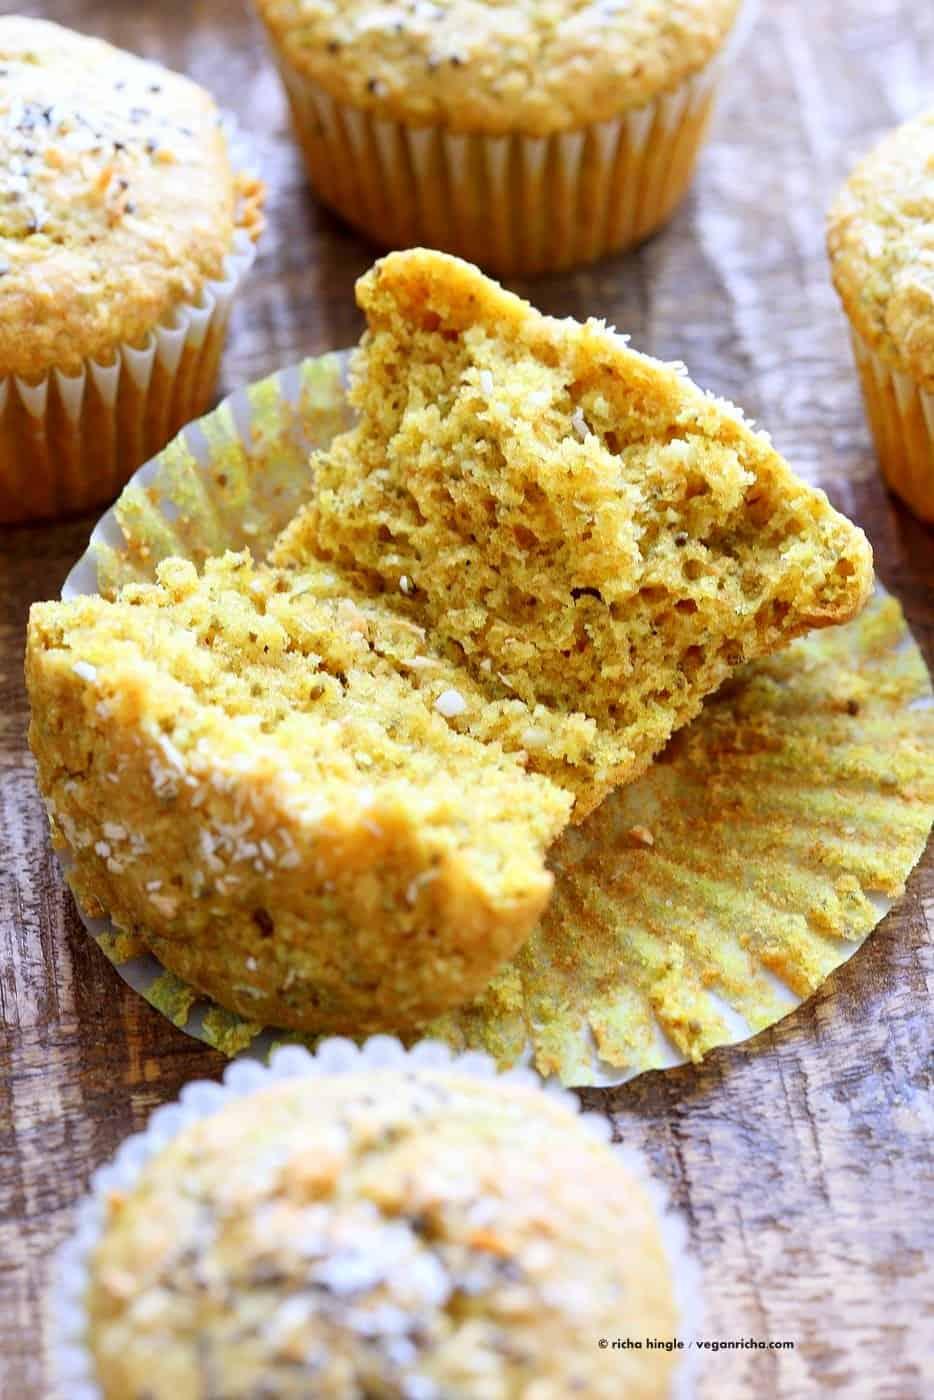 Lemon Coconut Chia Dairy-Free Muffins